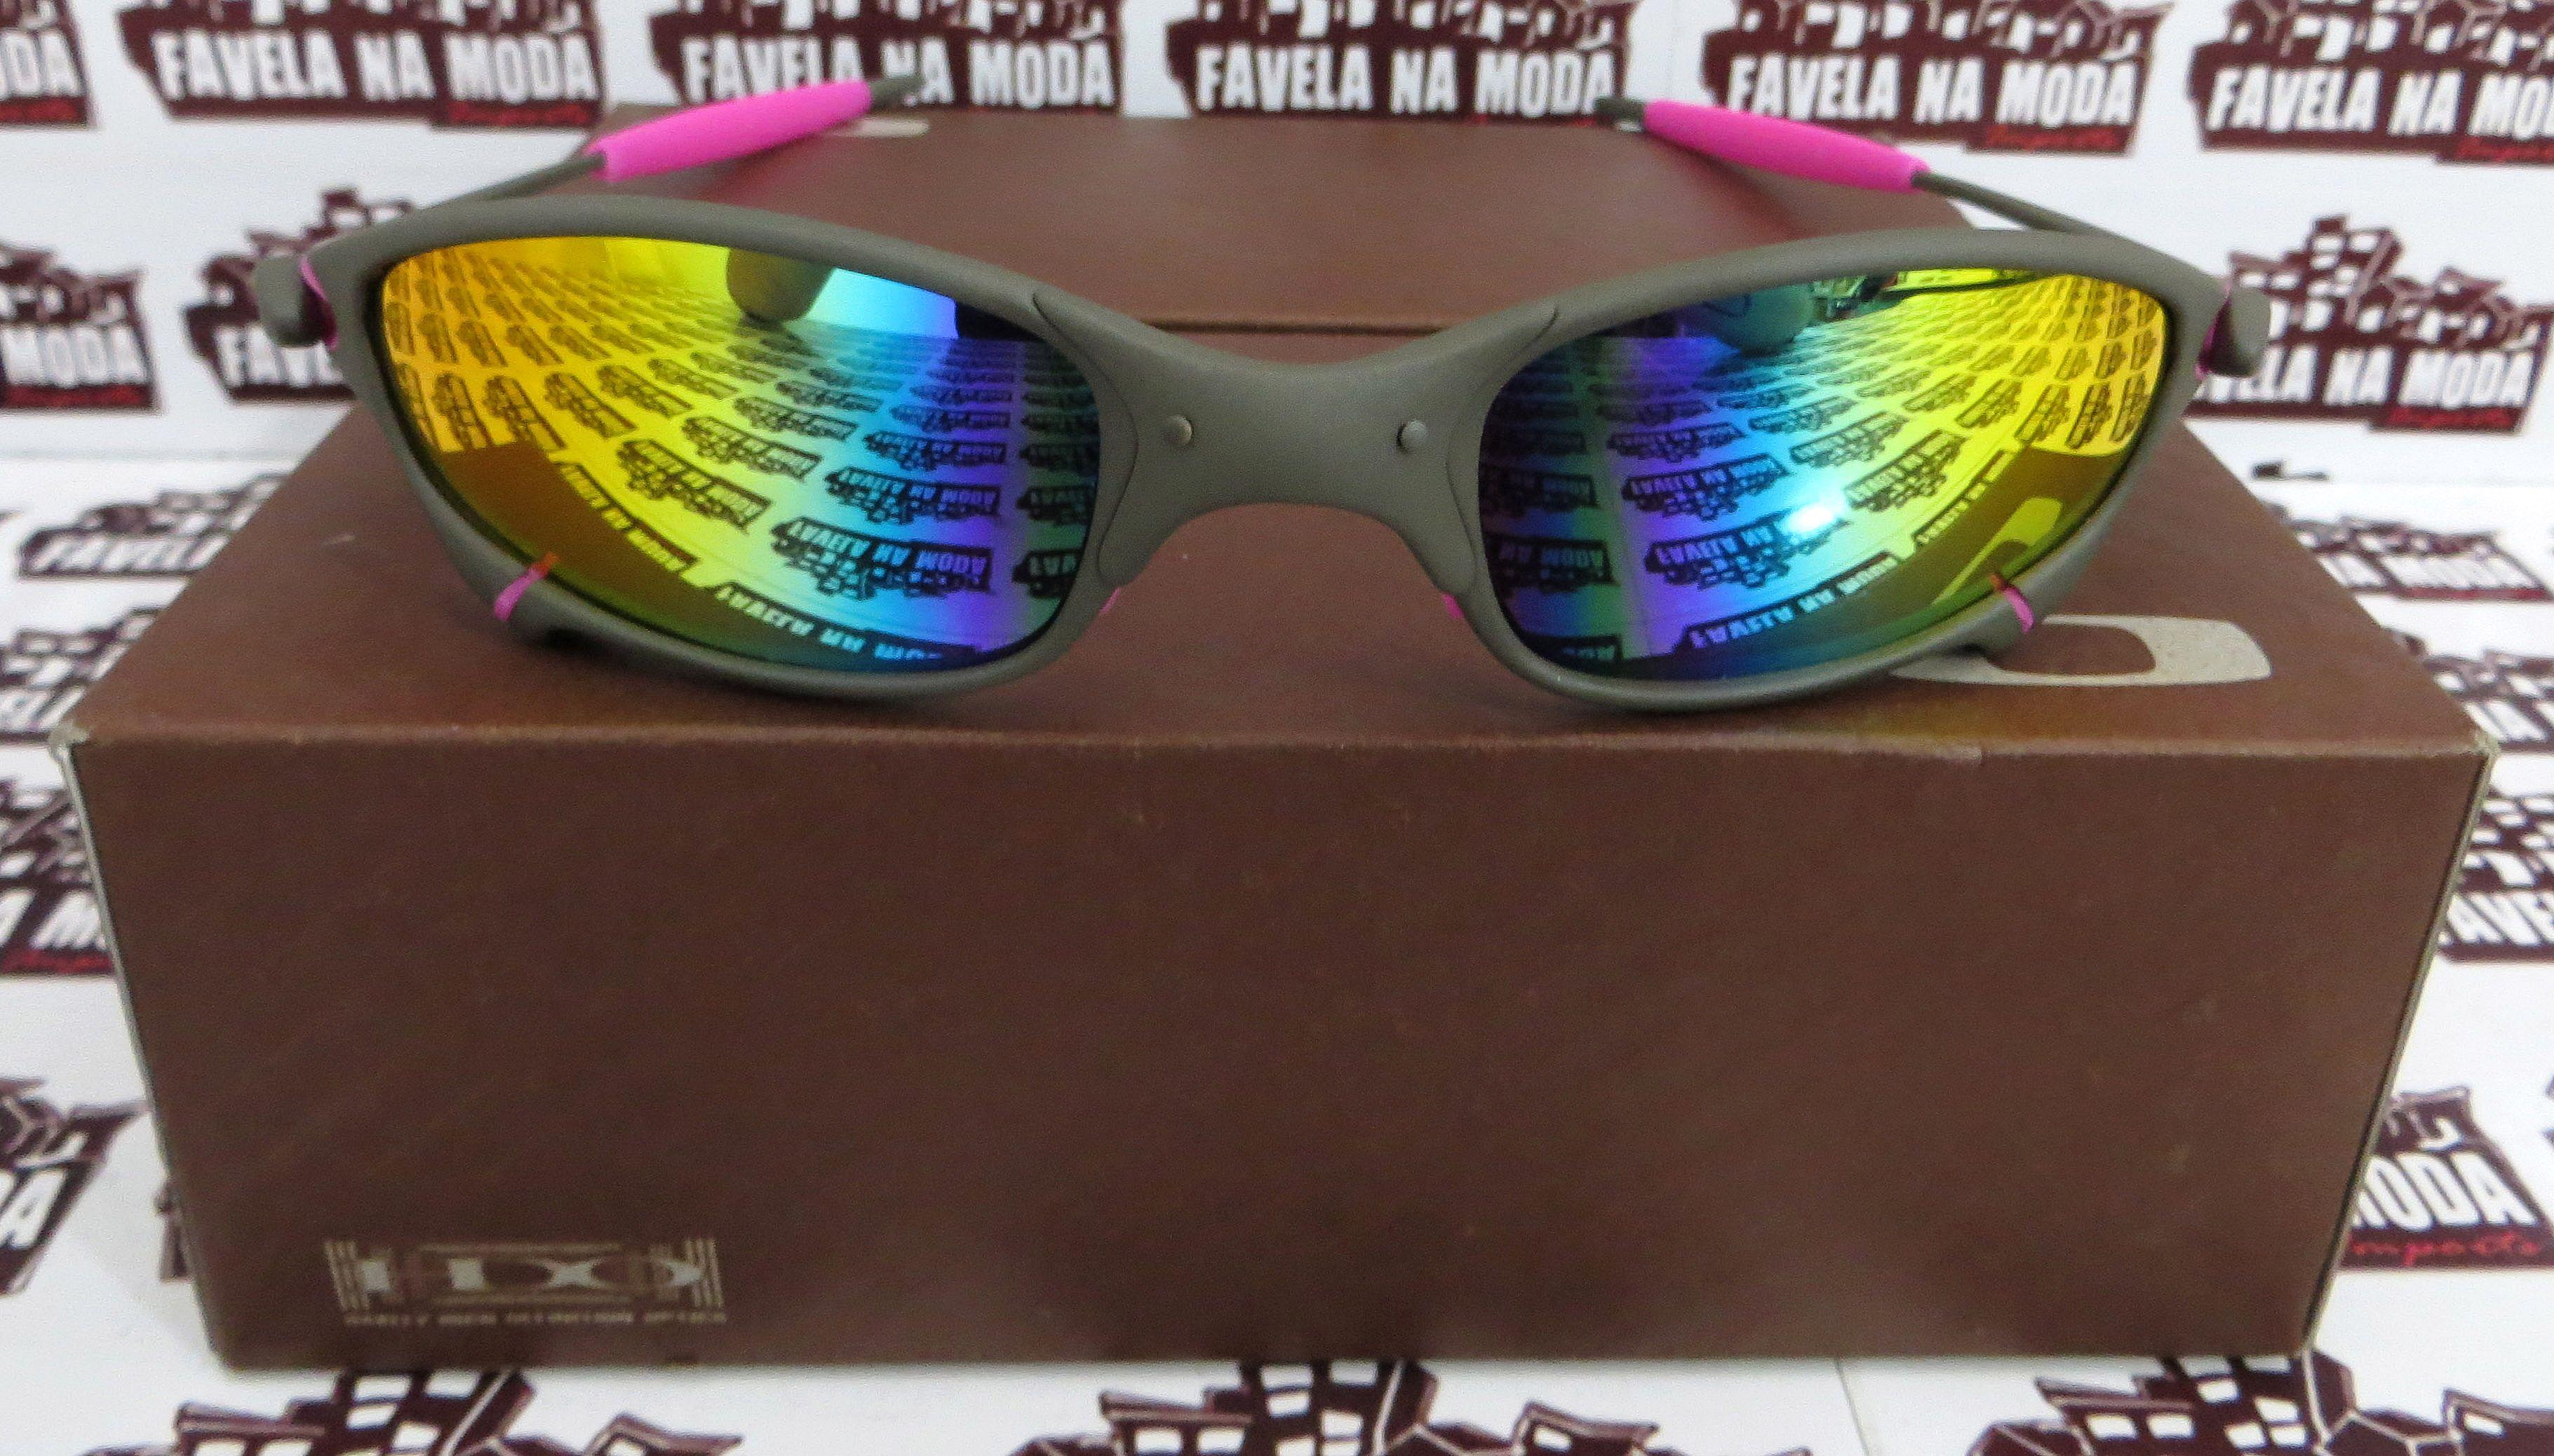 e0c6229fa Óculos Oakley Juliet - X-Metal / Arco Íris / Borrachas Rosas